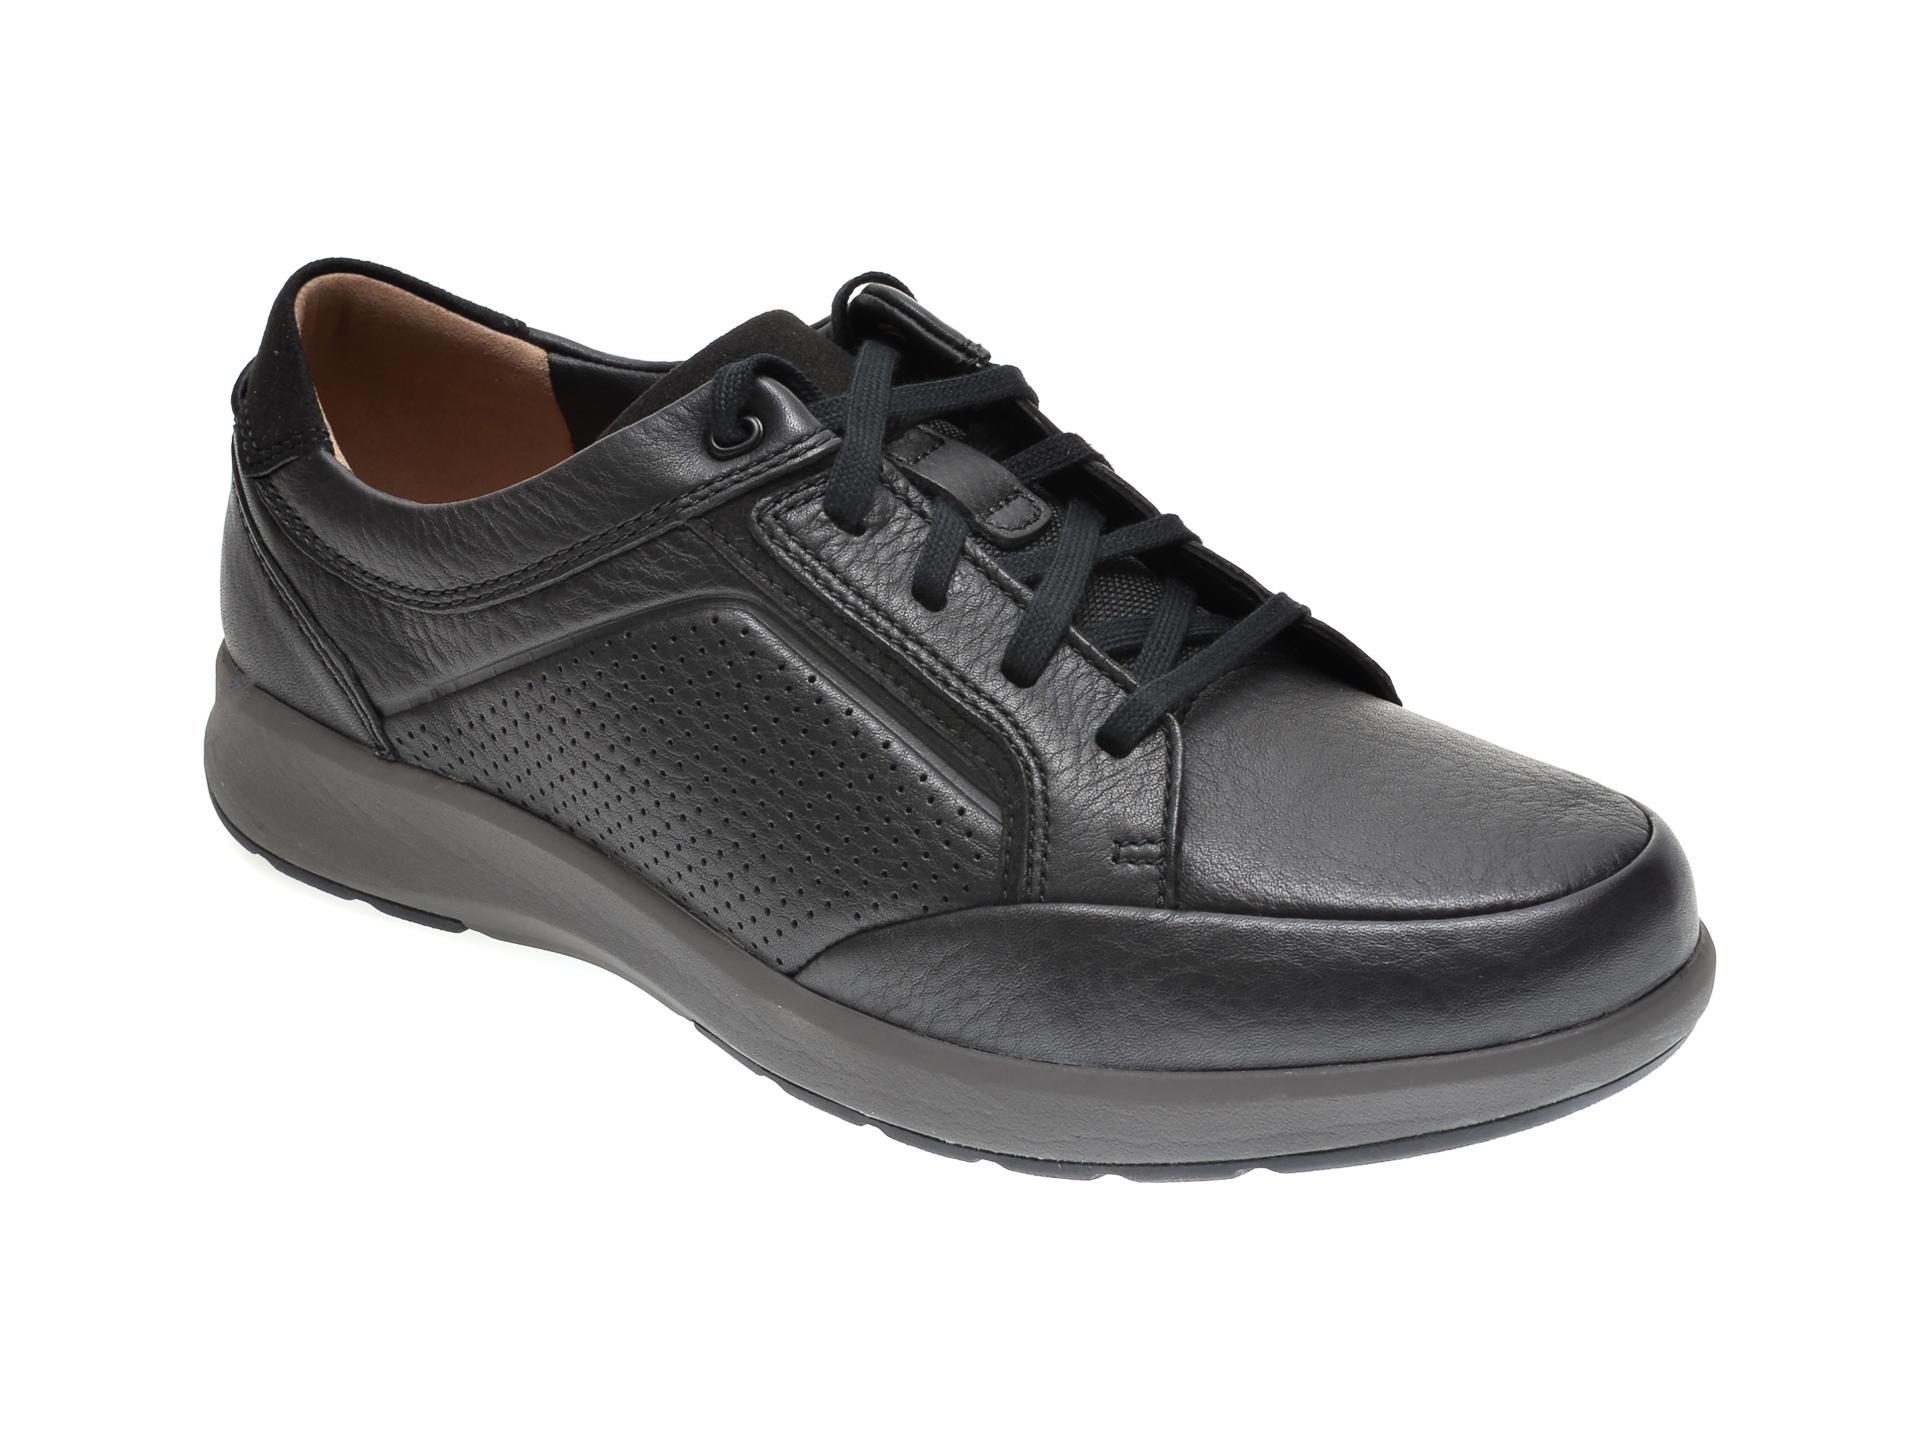 Pantofi CLARKS negri, UN LARVIK LACE, din piele naturala